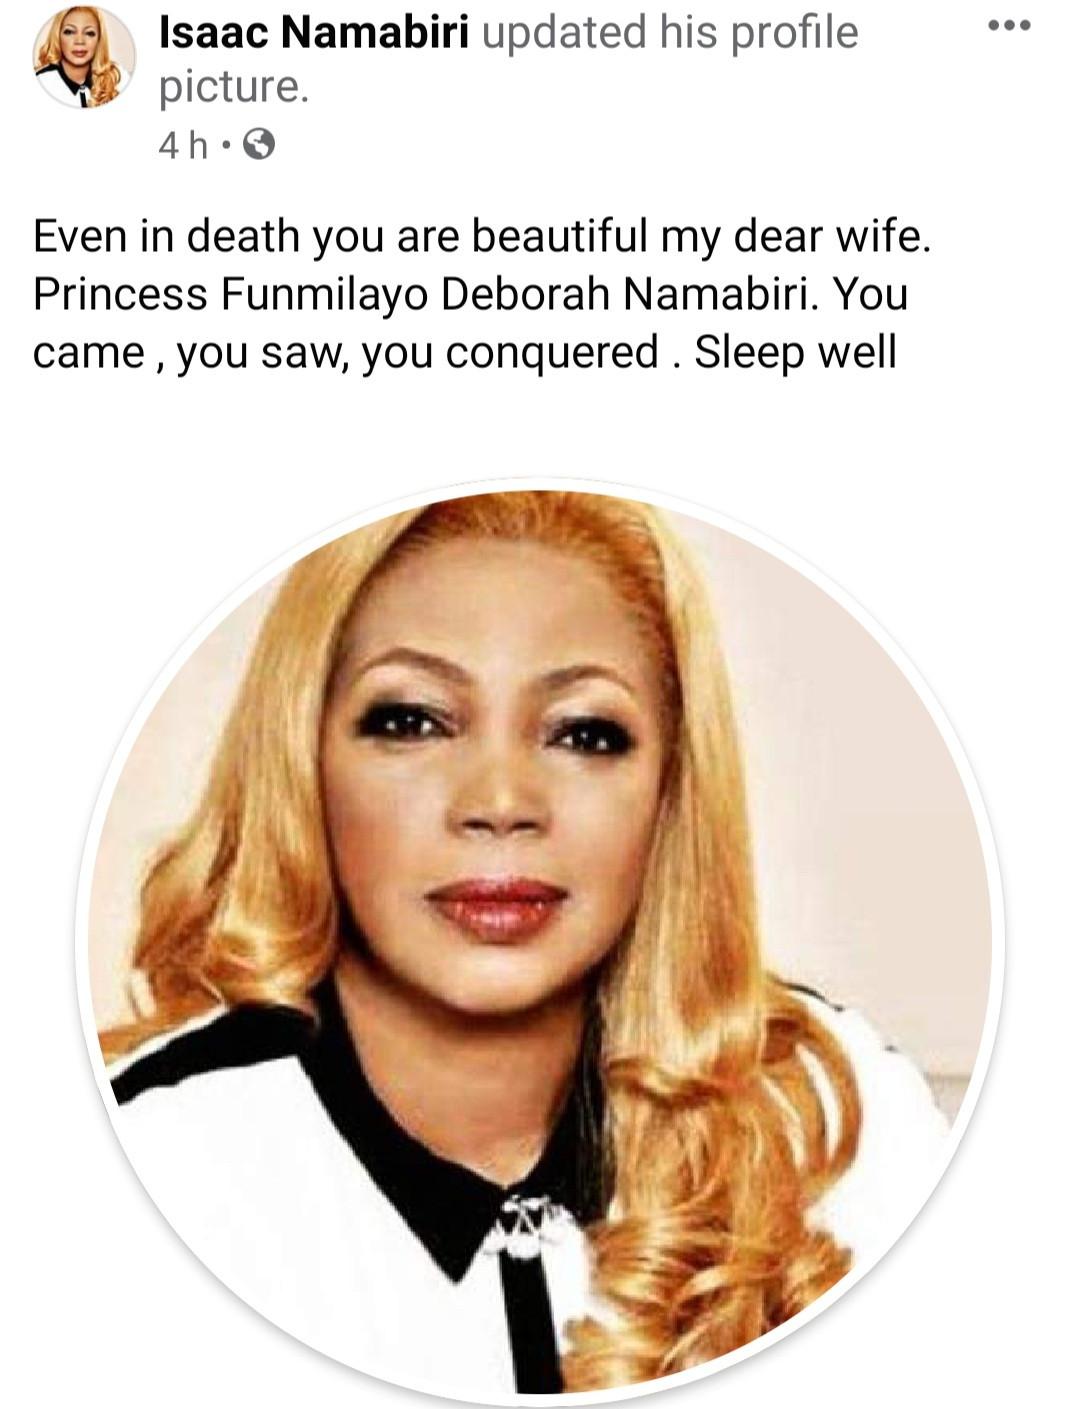 Hair entrepreneur,? Funmi Namabiri pouplarly known as Funmi Hair, dies